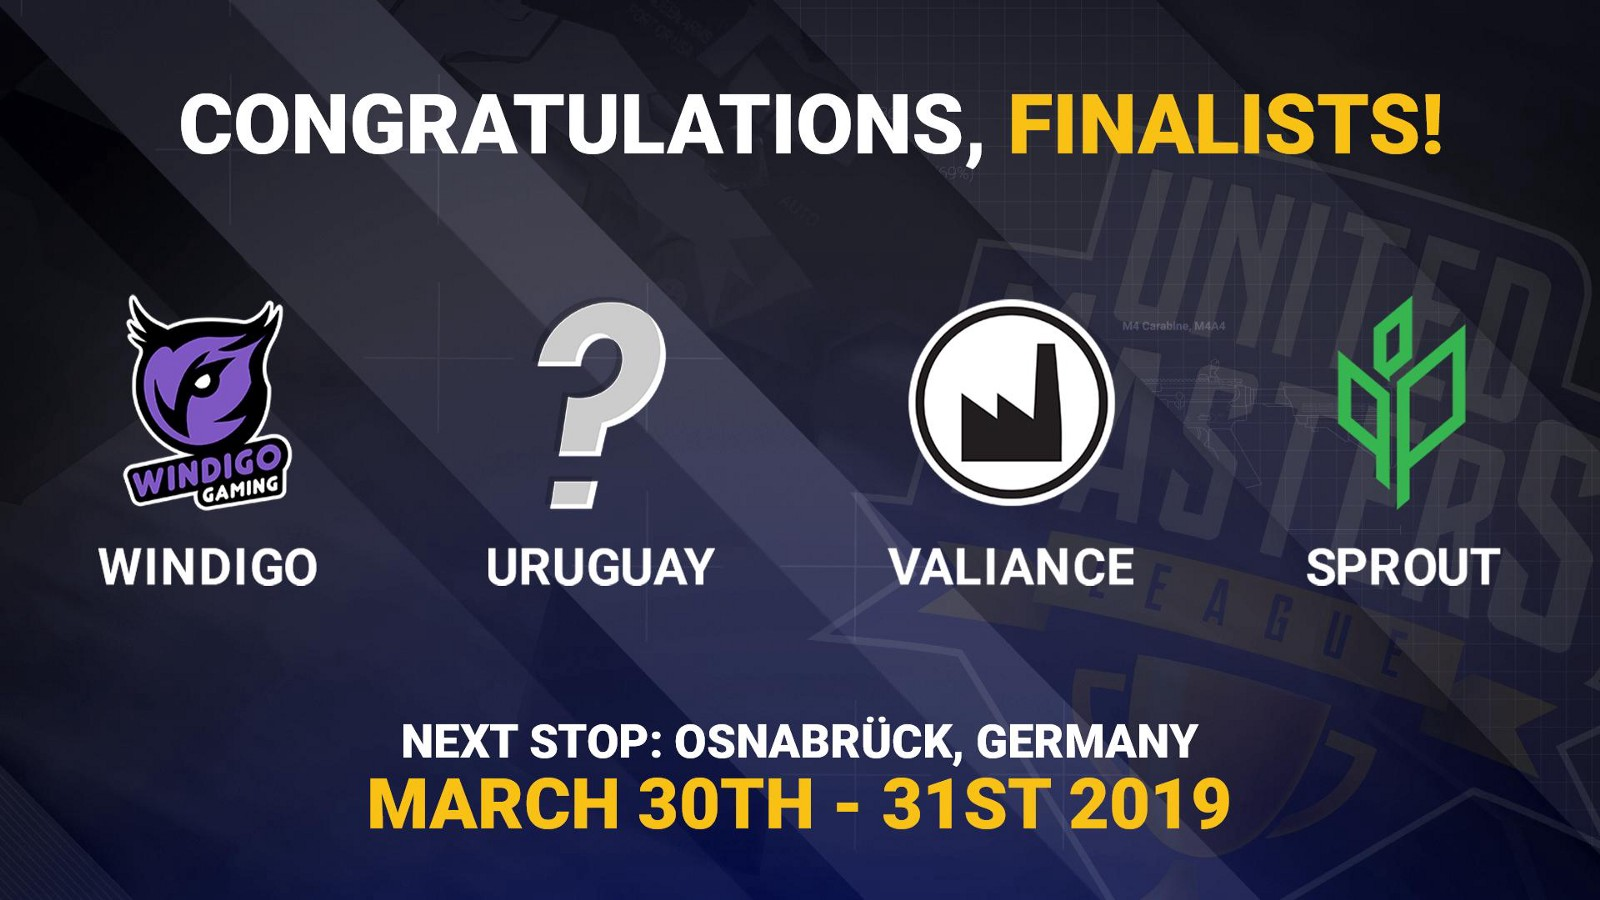 United Finalists